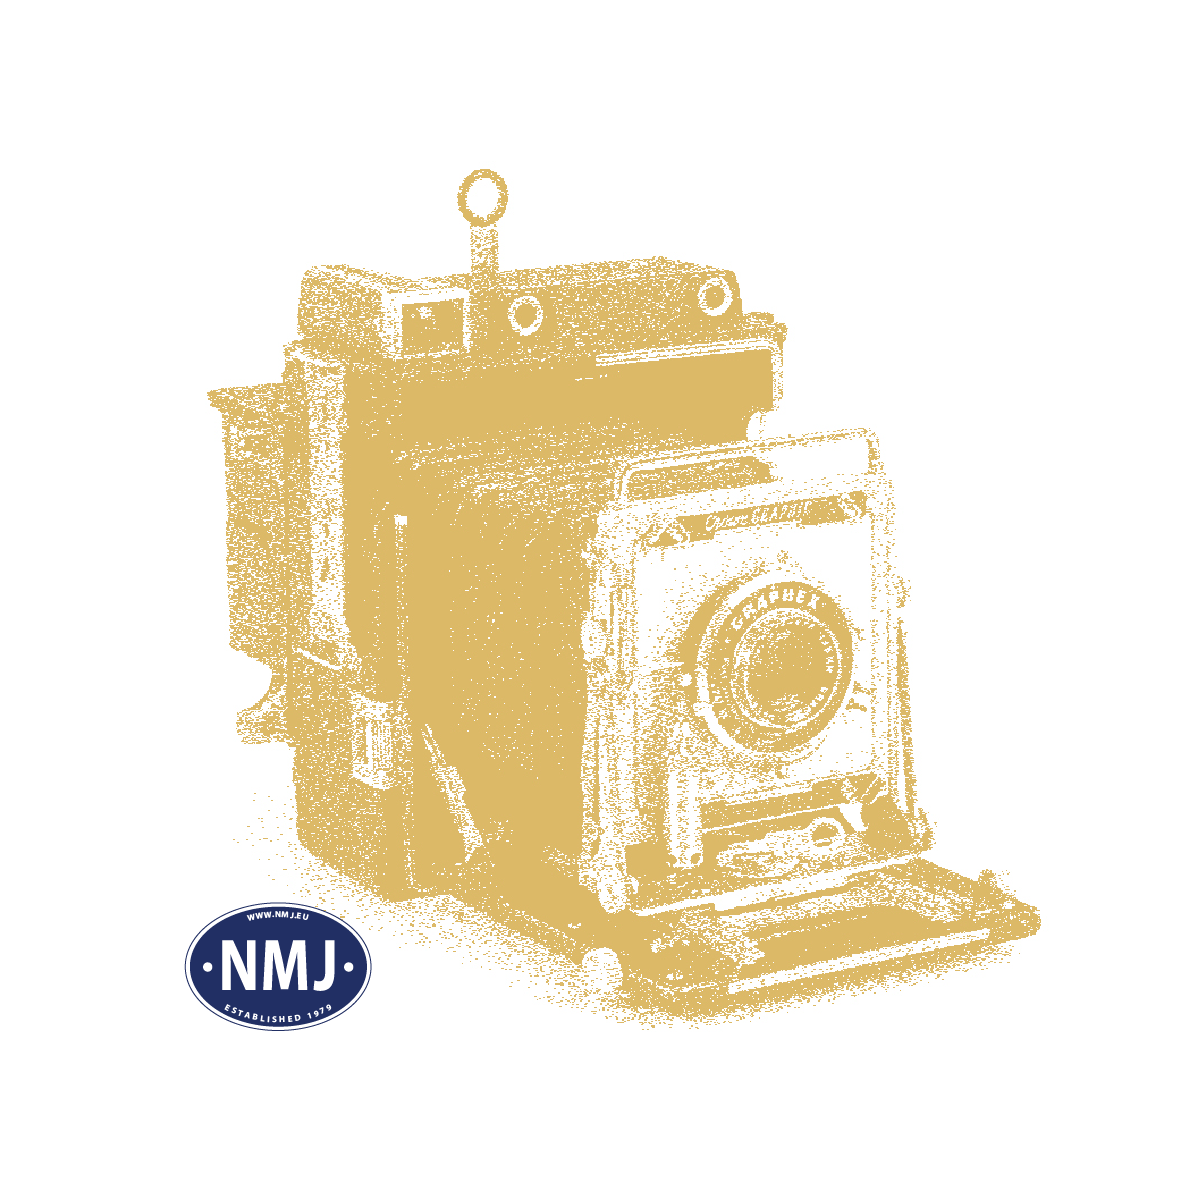 NMJT95406 - NMJ Topline SNCB 5209, AC Digital